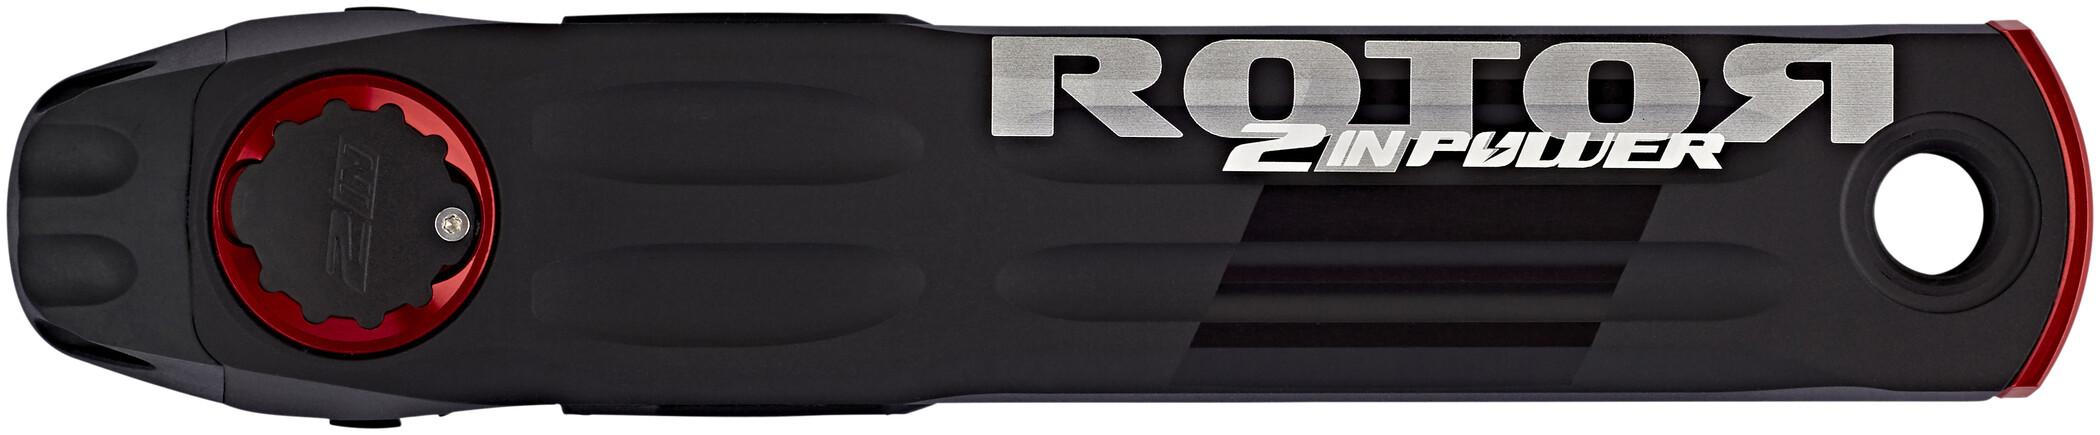 Rotor 2Inpower Road Krank DM, black (2019) | Powermeter